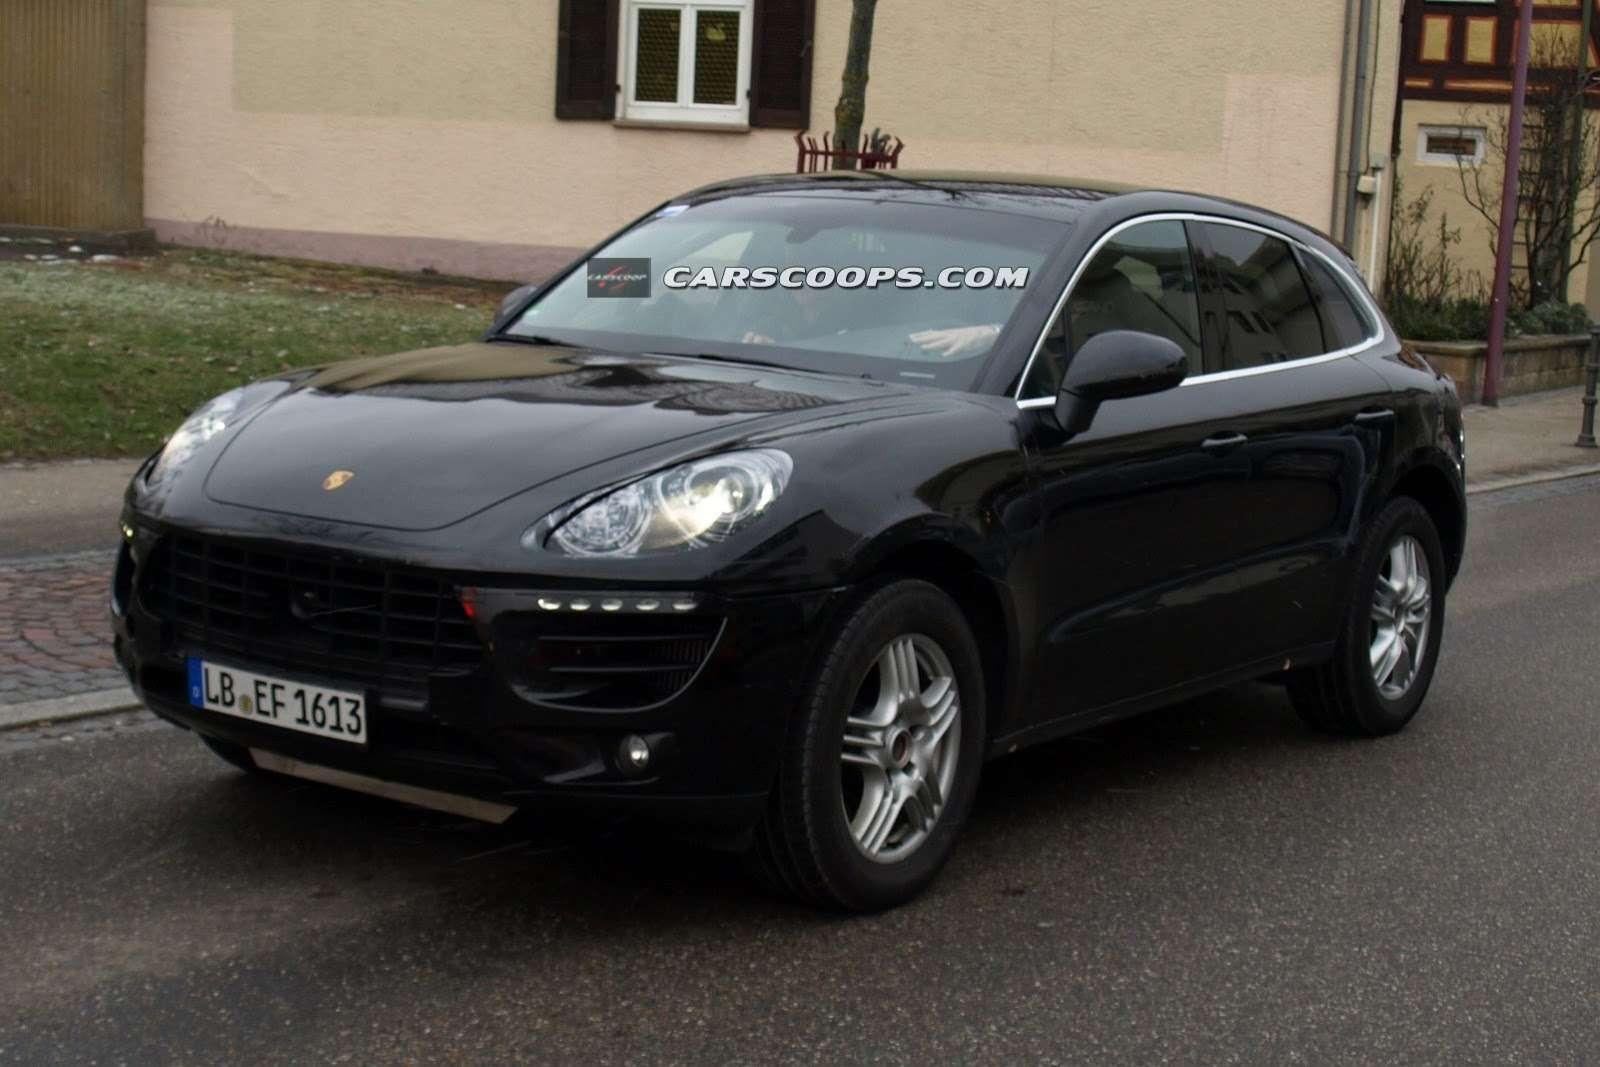 nocopyright Porsche Macan Launch Interiors4